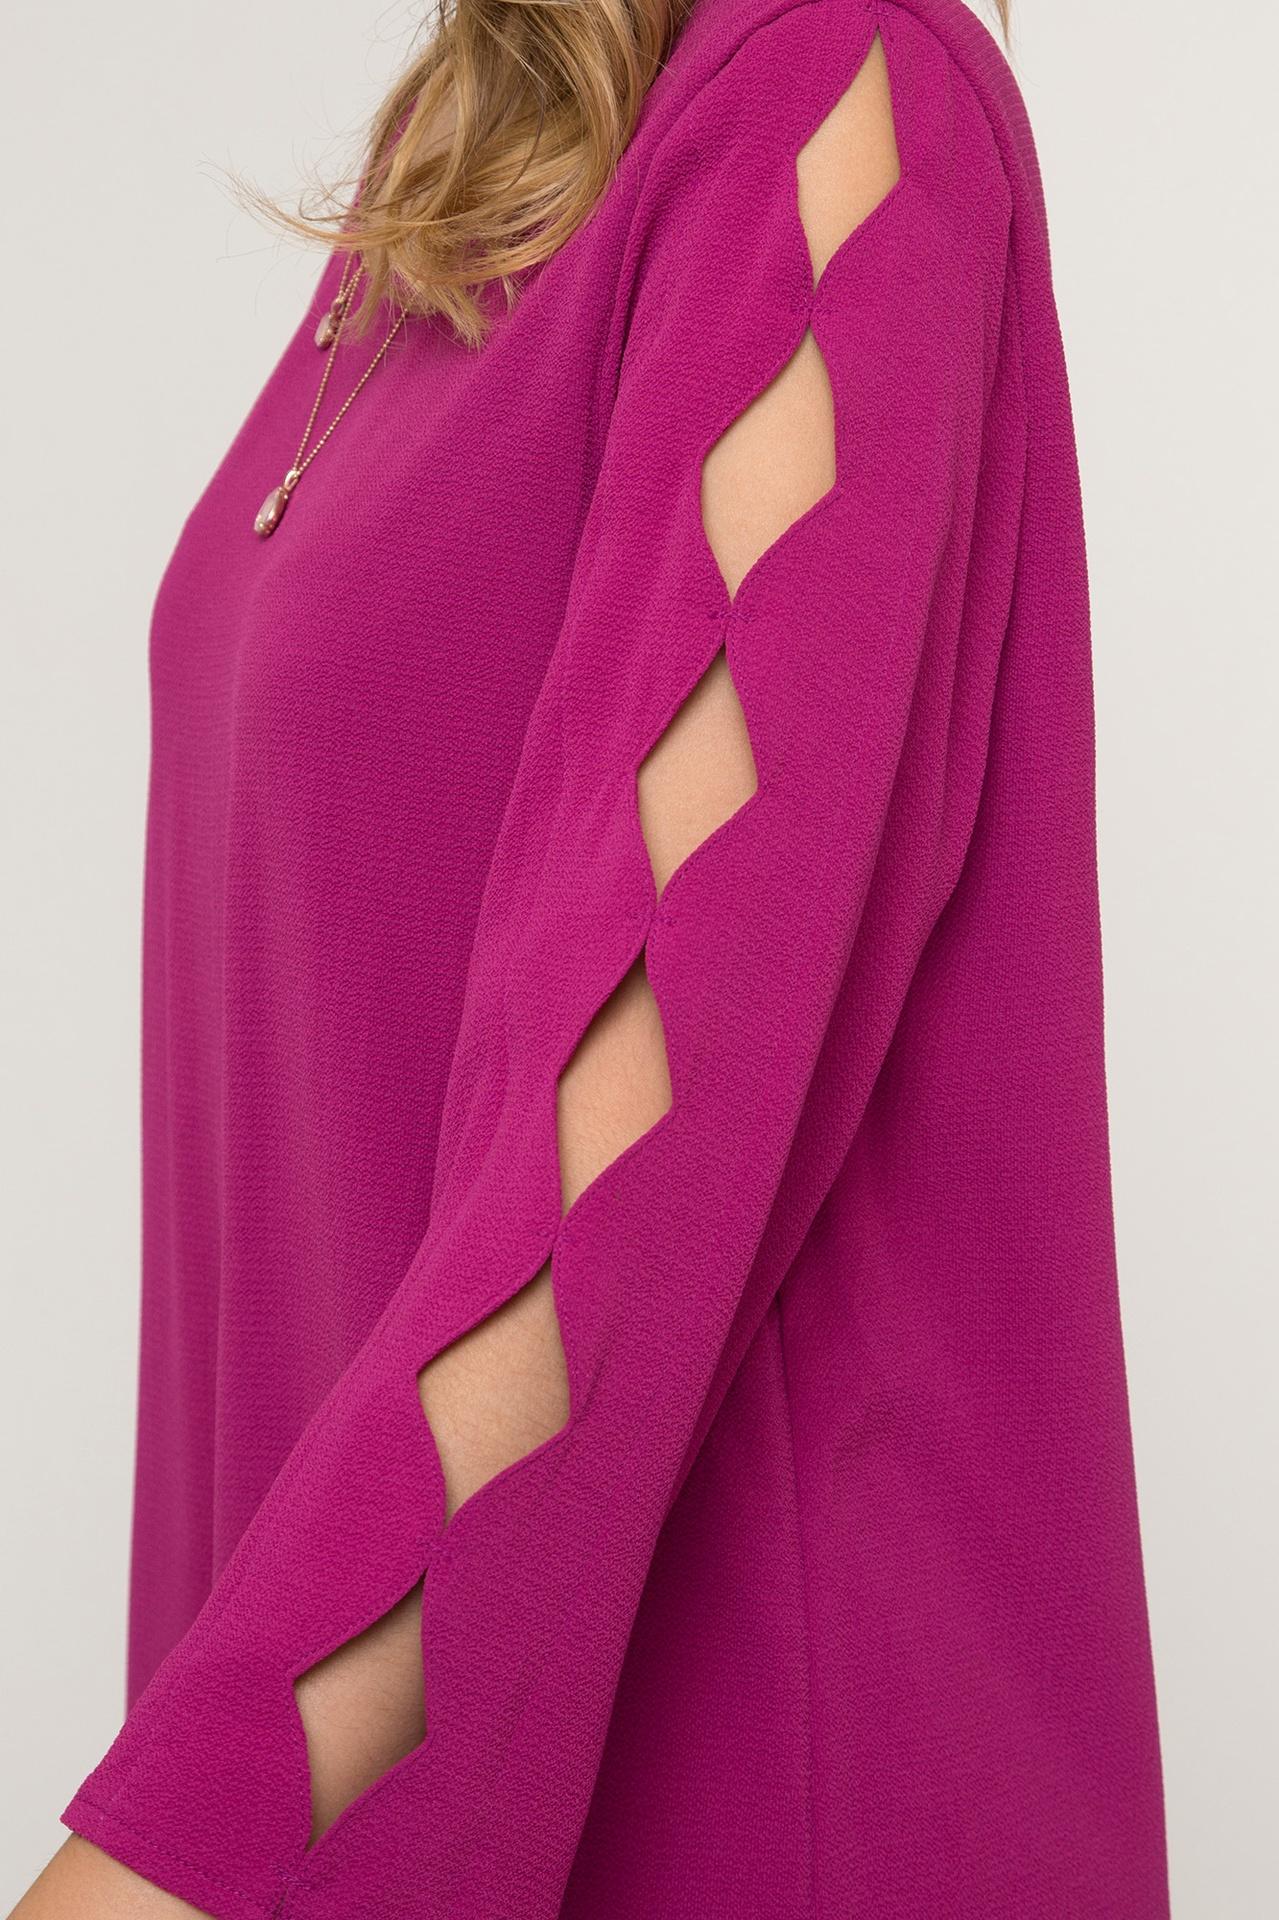 Magenta 3/4 Slv Dress w Scallop Cut Out Slv